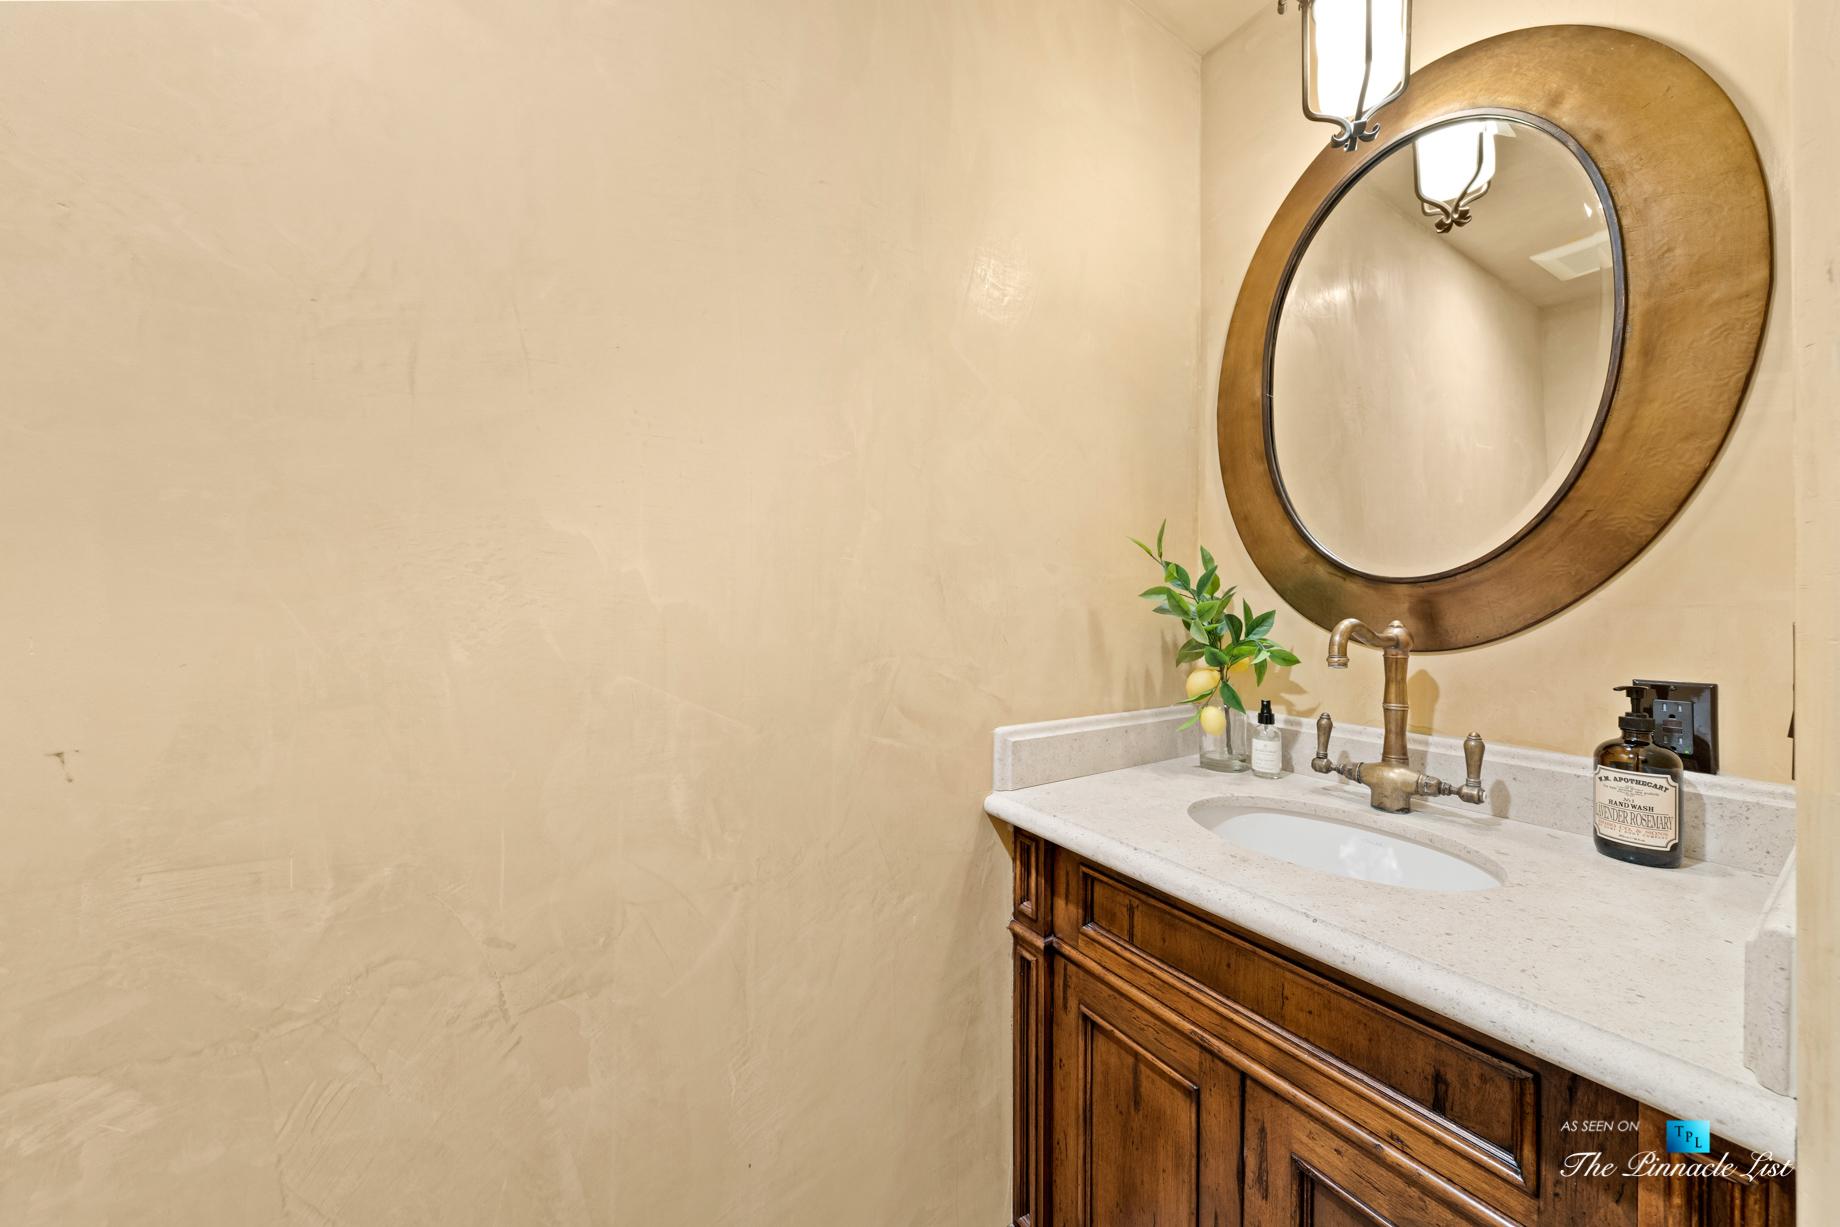 216 7th St, Manhattan Beach, CA, USA – Luxury Real Estate – Coastal Villa Home – Washroom